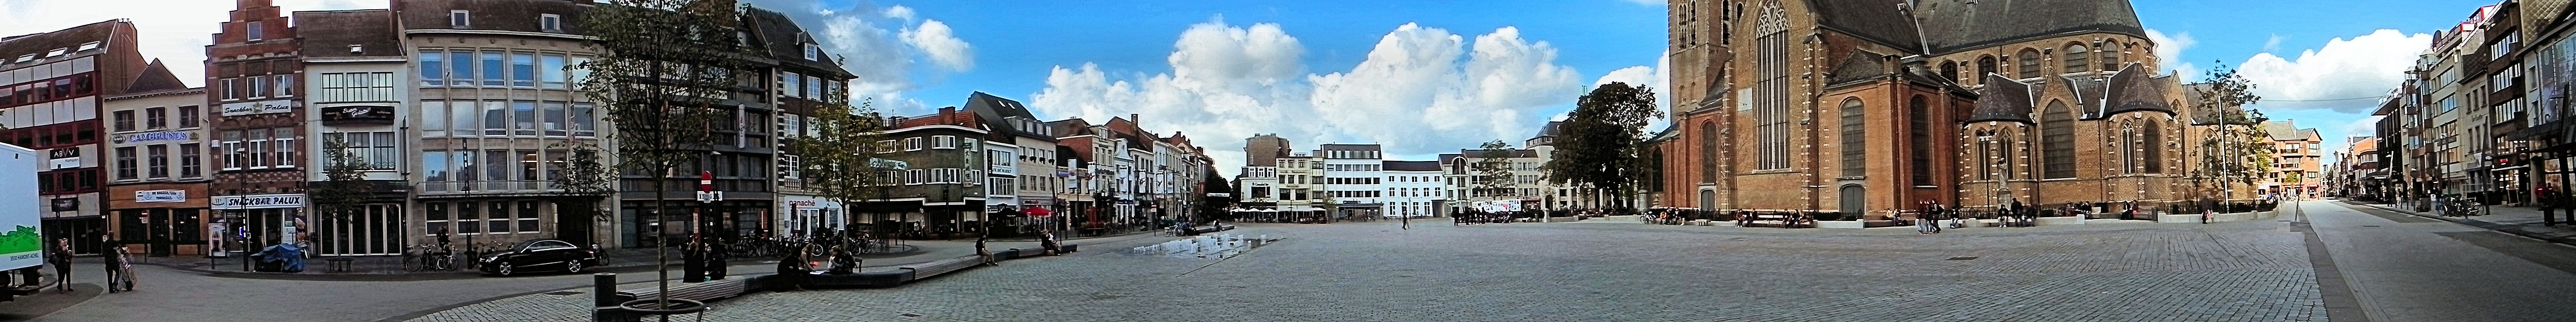 Belgium - Turnhout. Grote Markt (Main Market) with Saint Peter Church